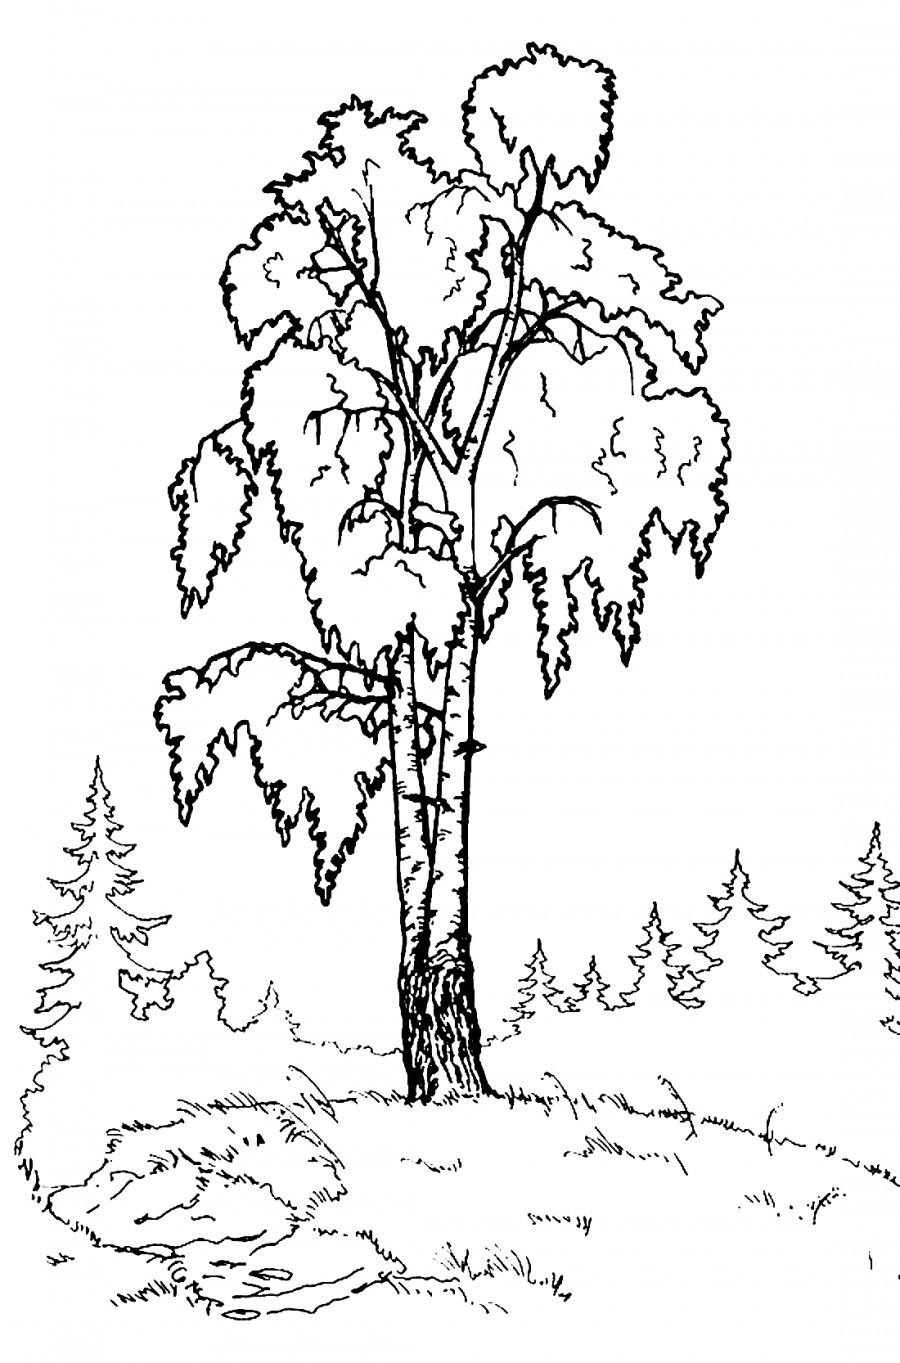 Береза на полянке - раскраска №3989 | Printonic.ru